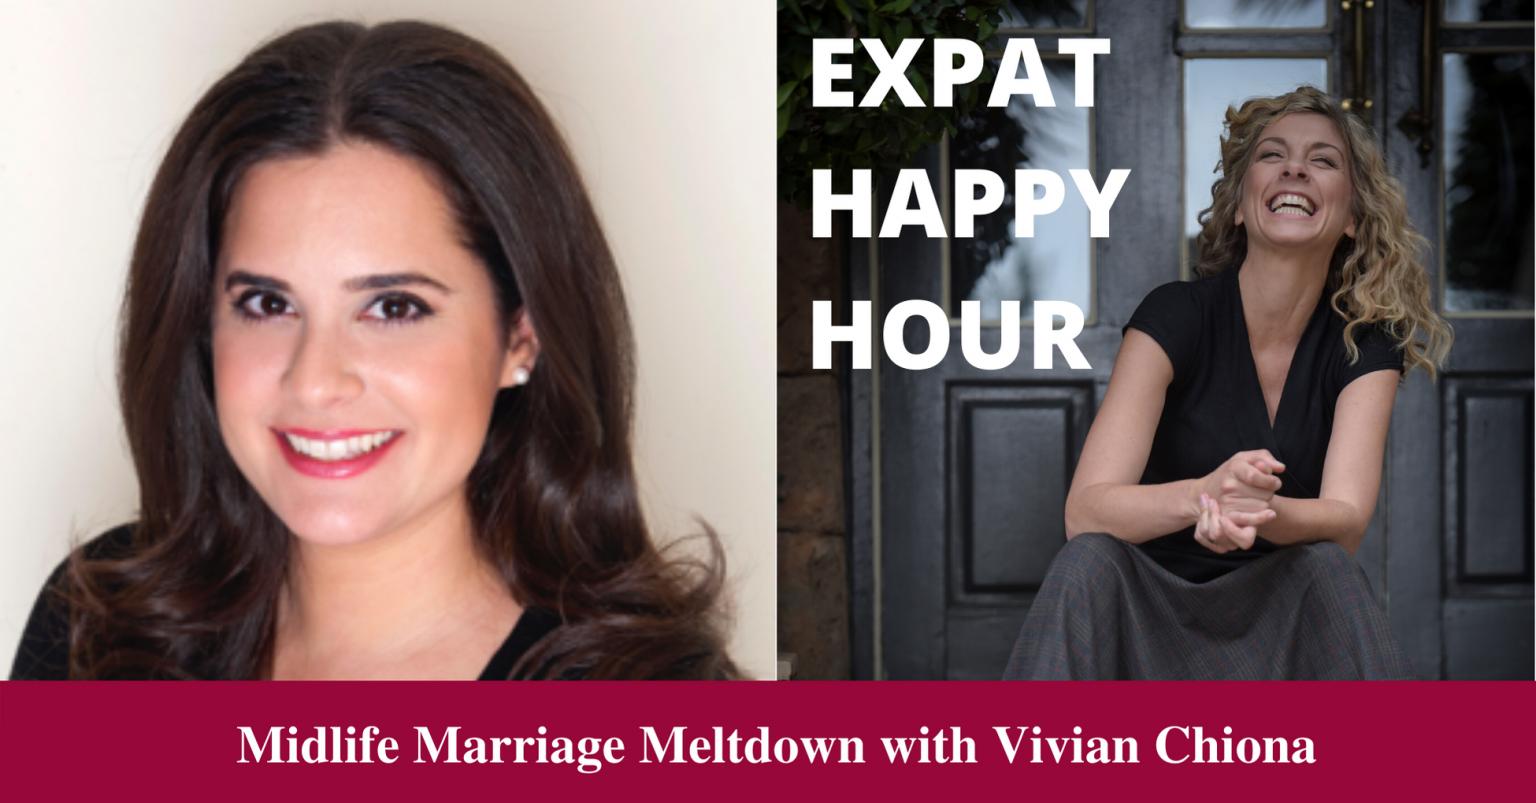 expat-nest-marriage-midlife-crisis-vivian-chiona